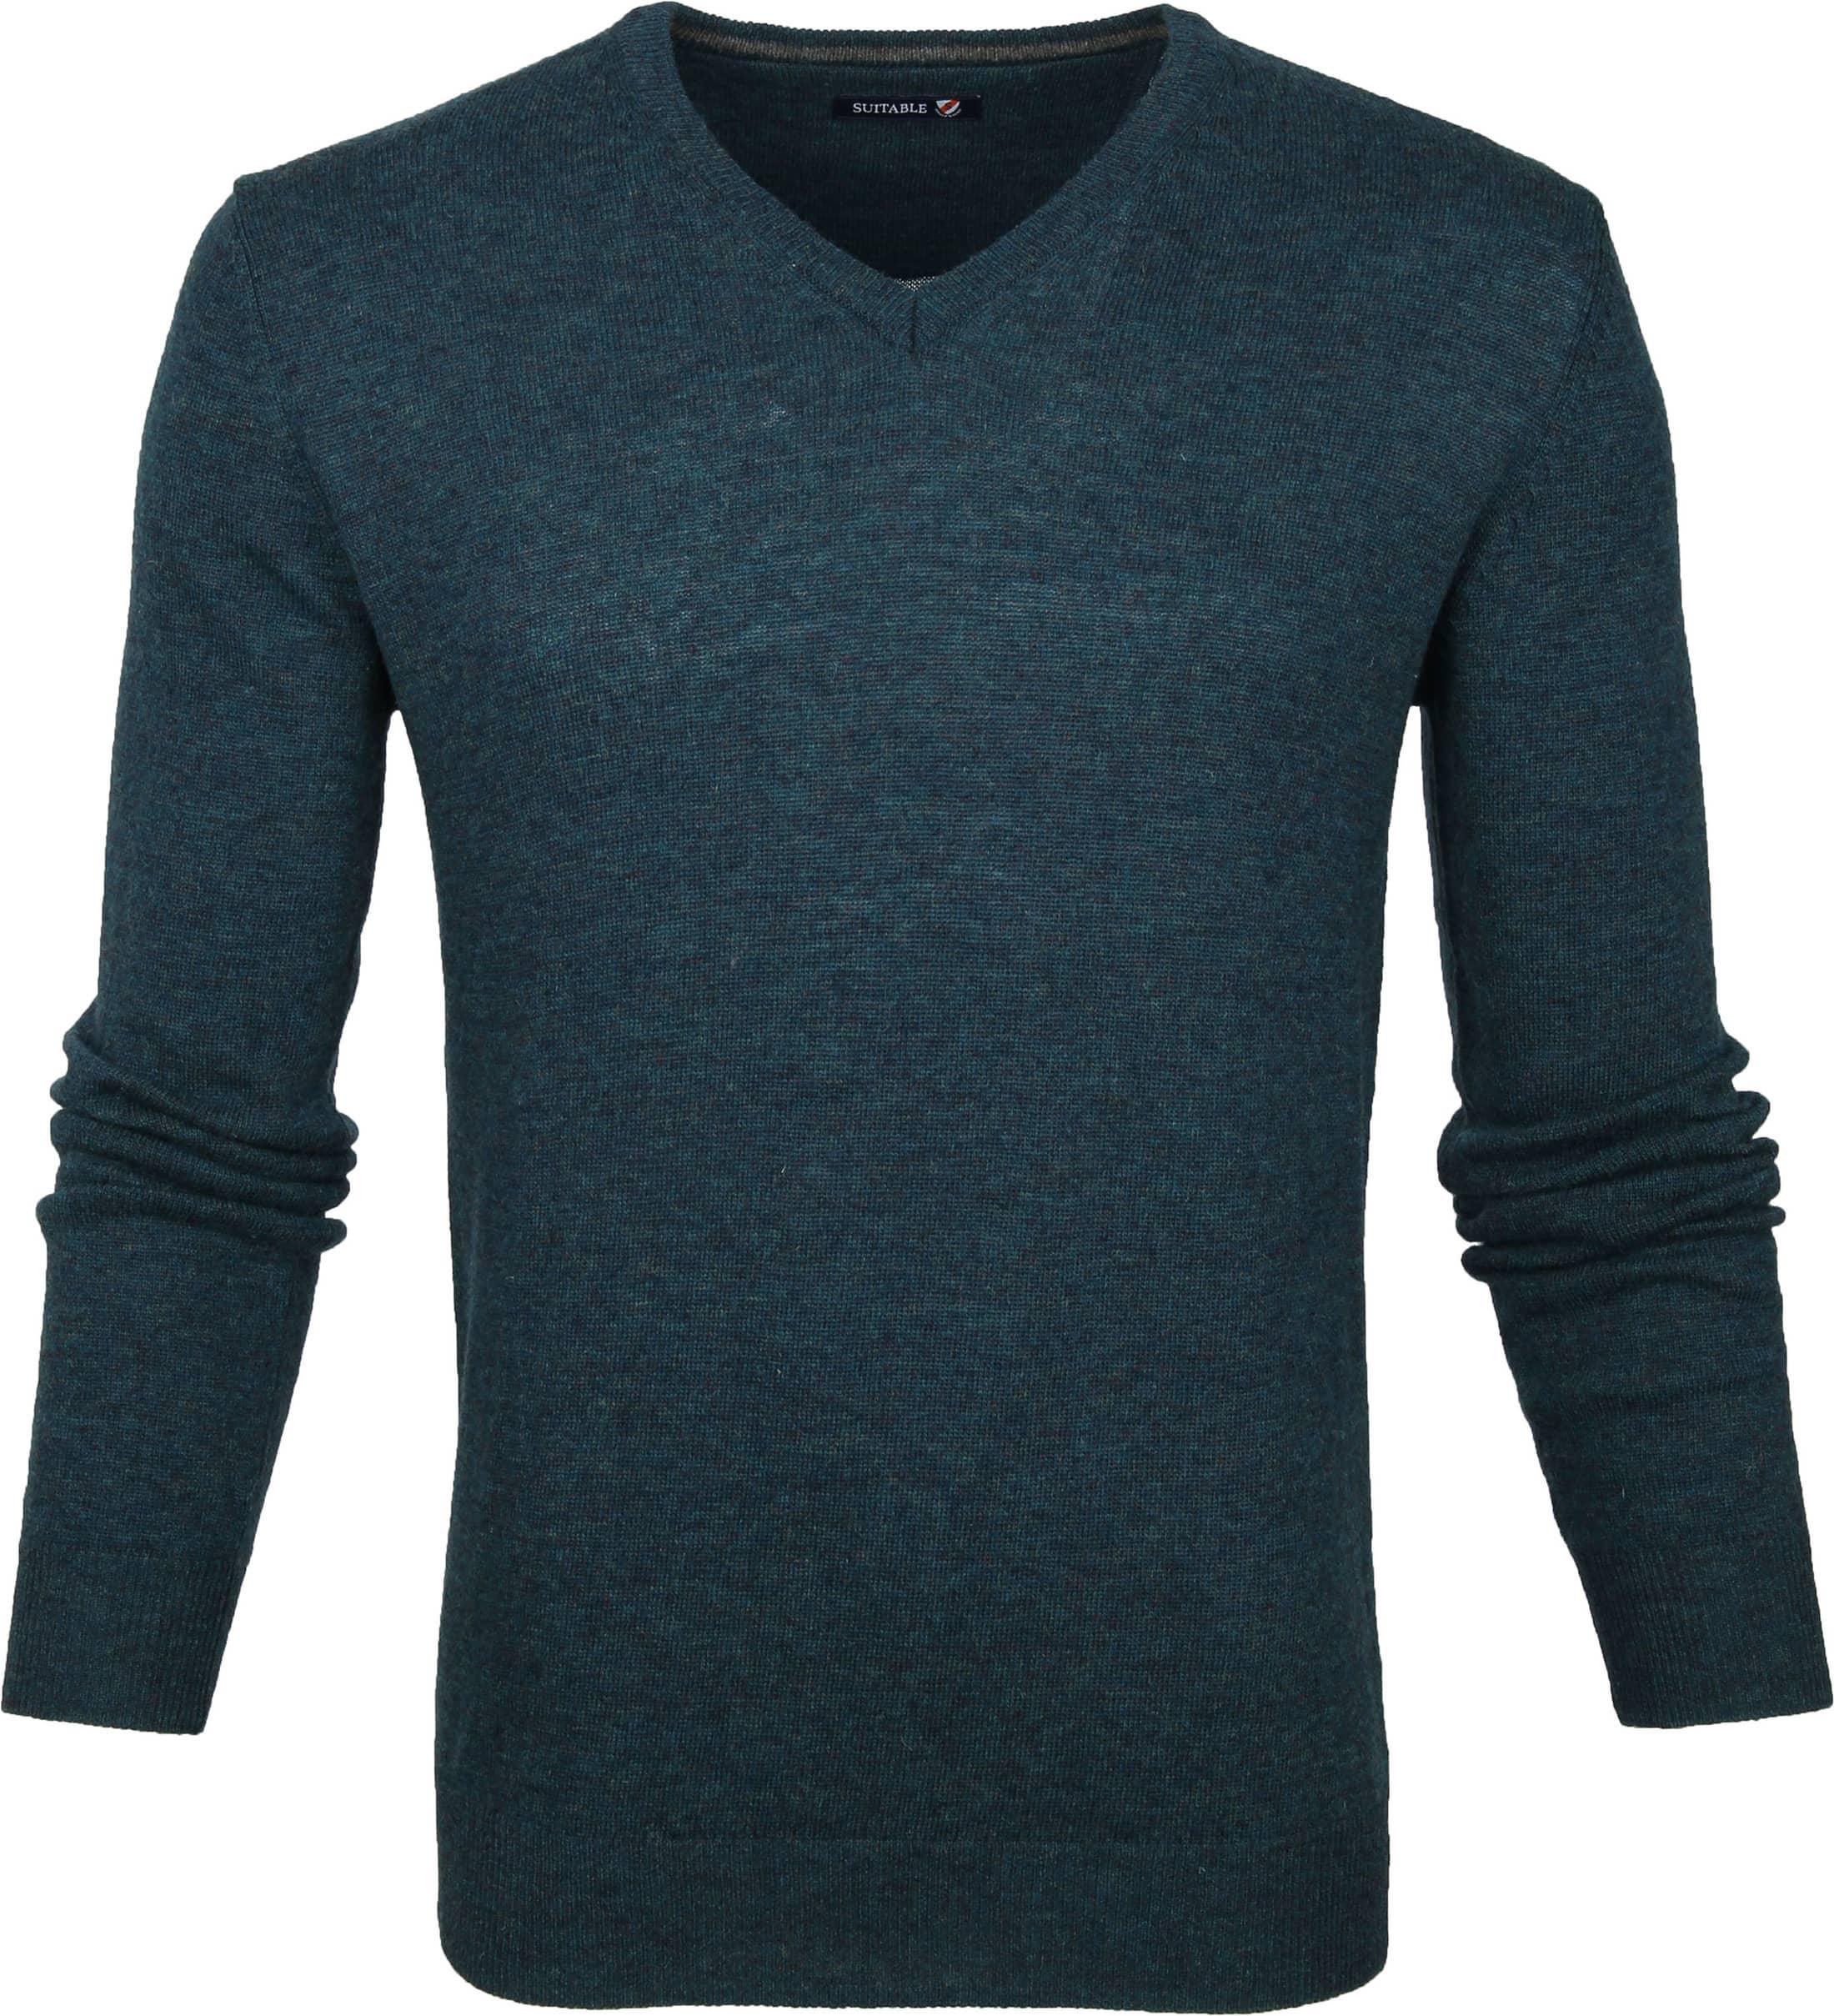 Suitable Lamswol Pullover V-Hals Groen